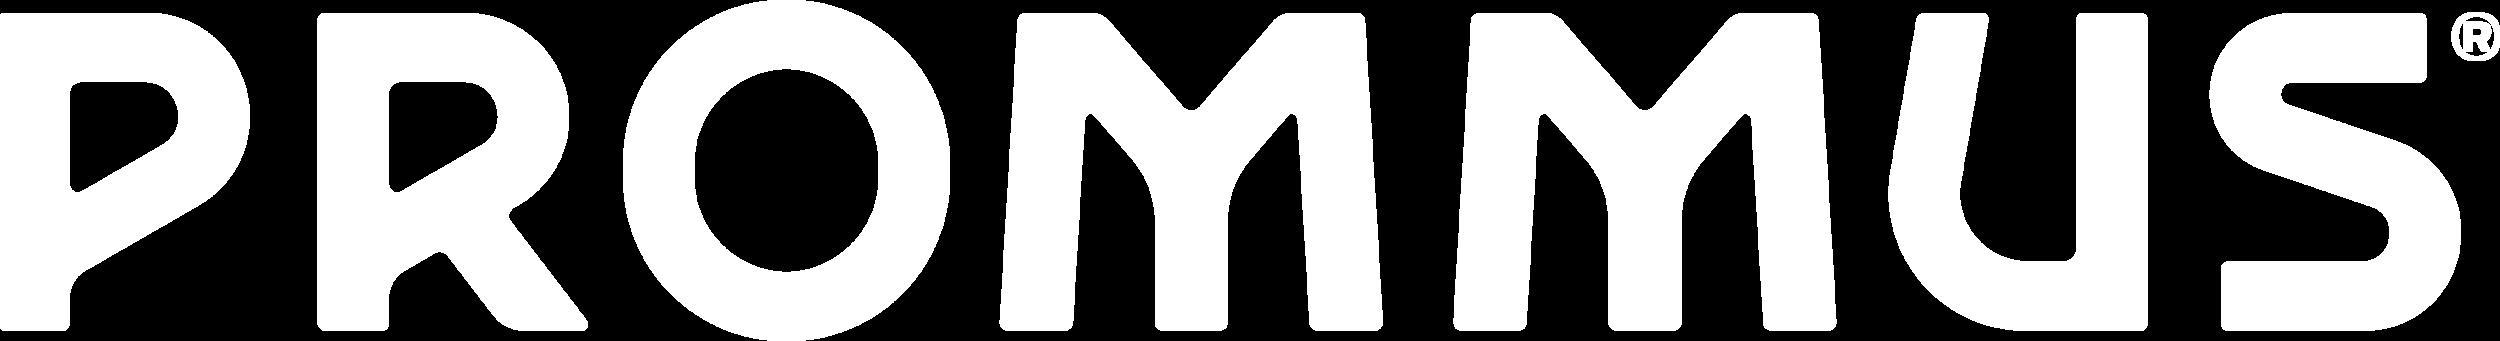 Prommus_LogoWhite (3).png